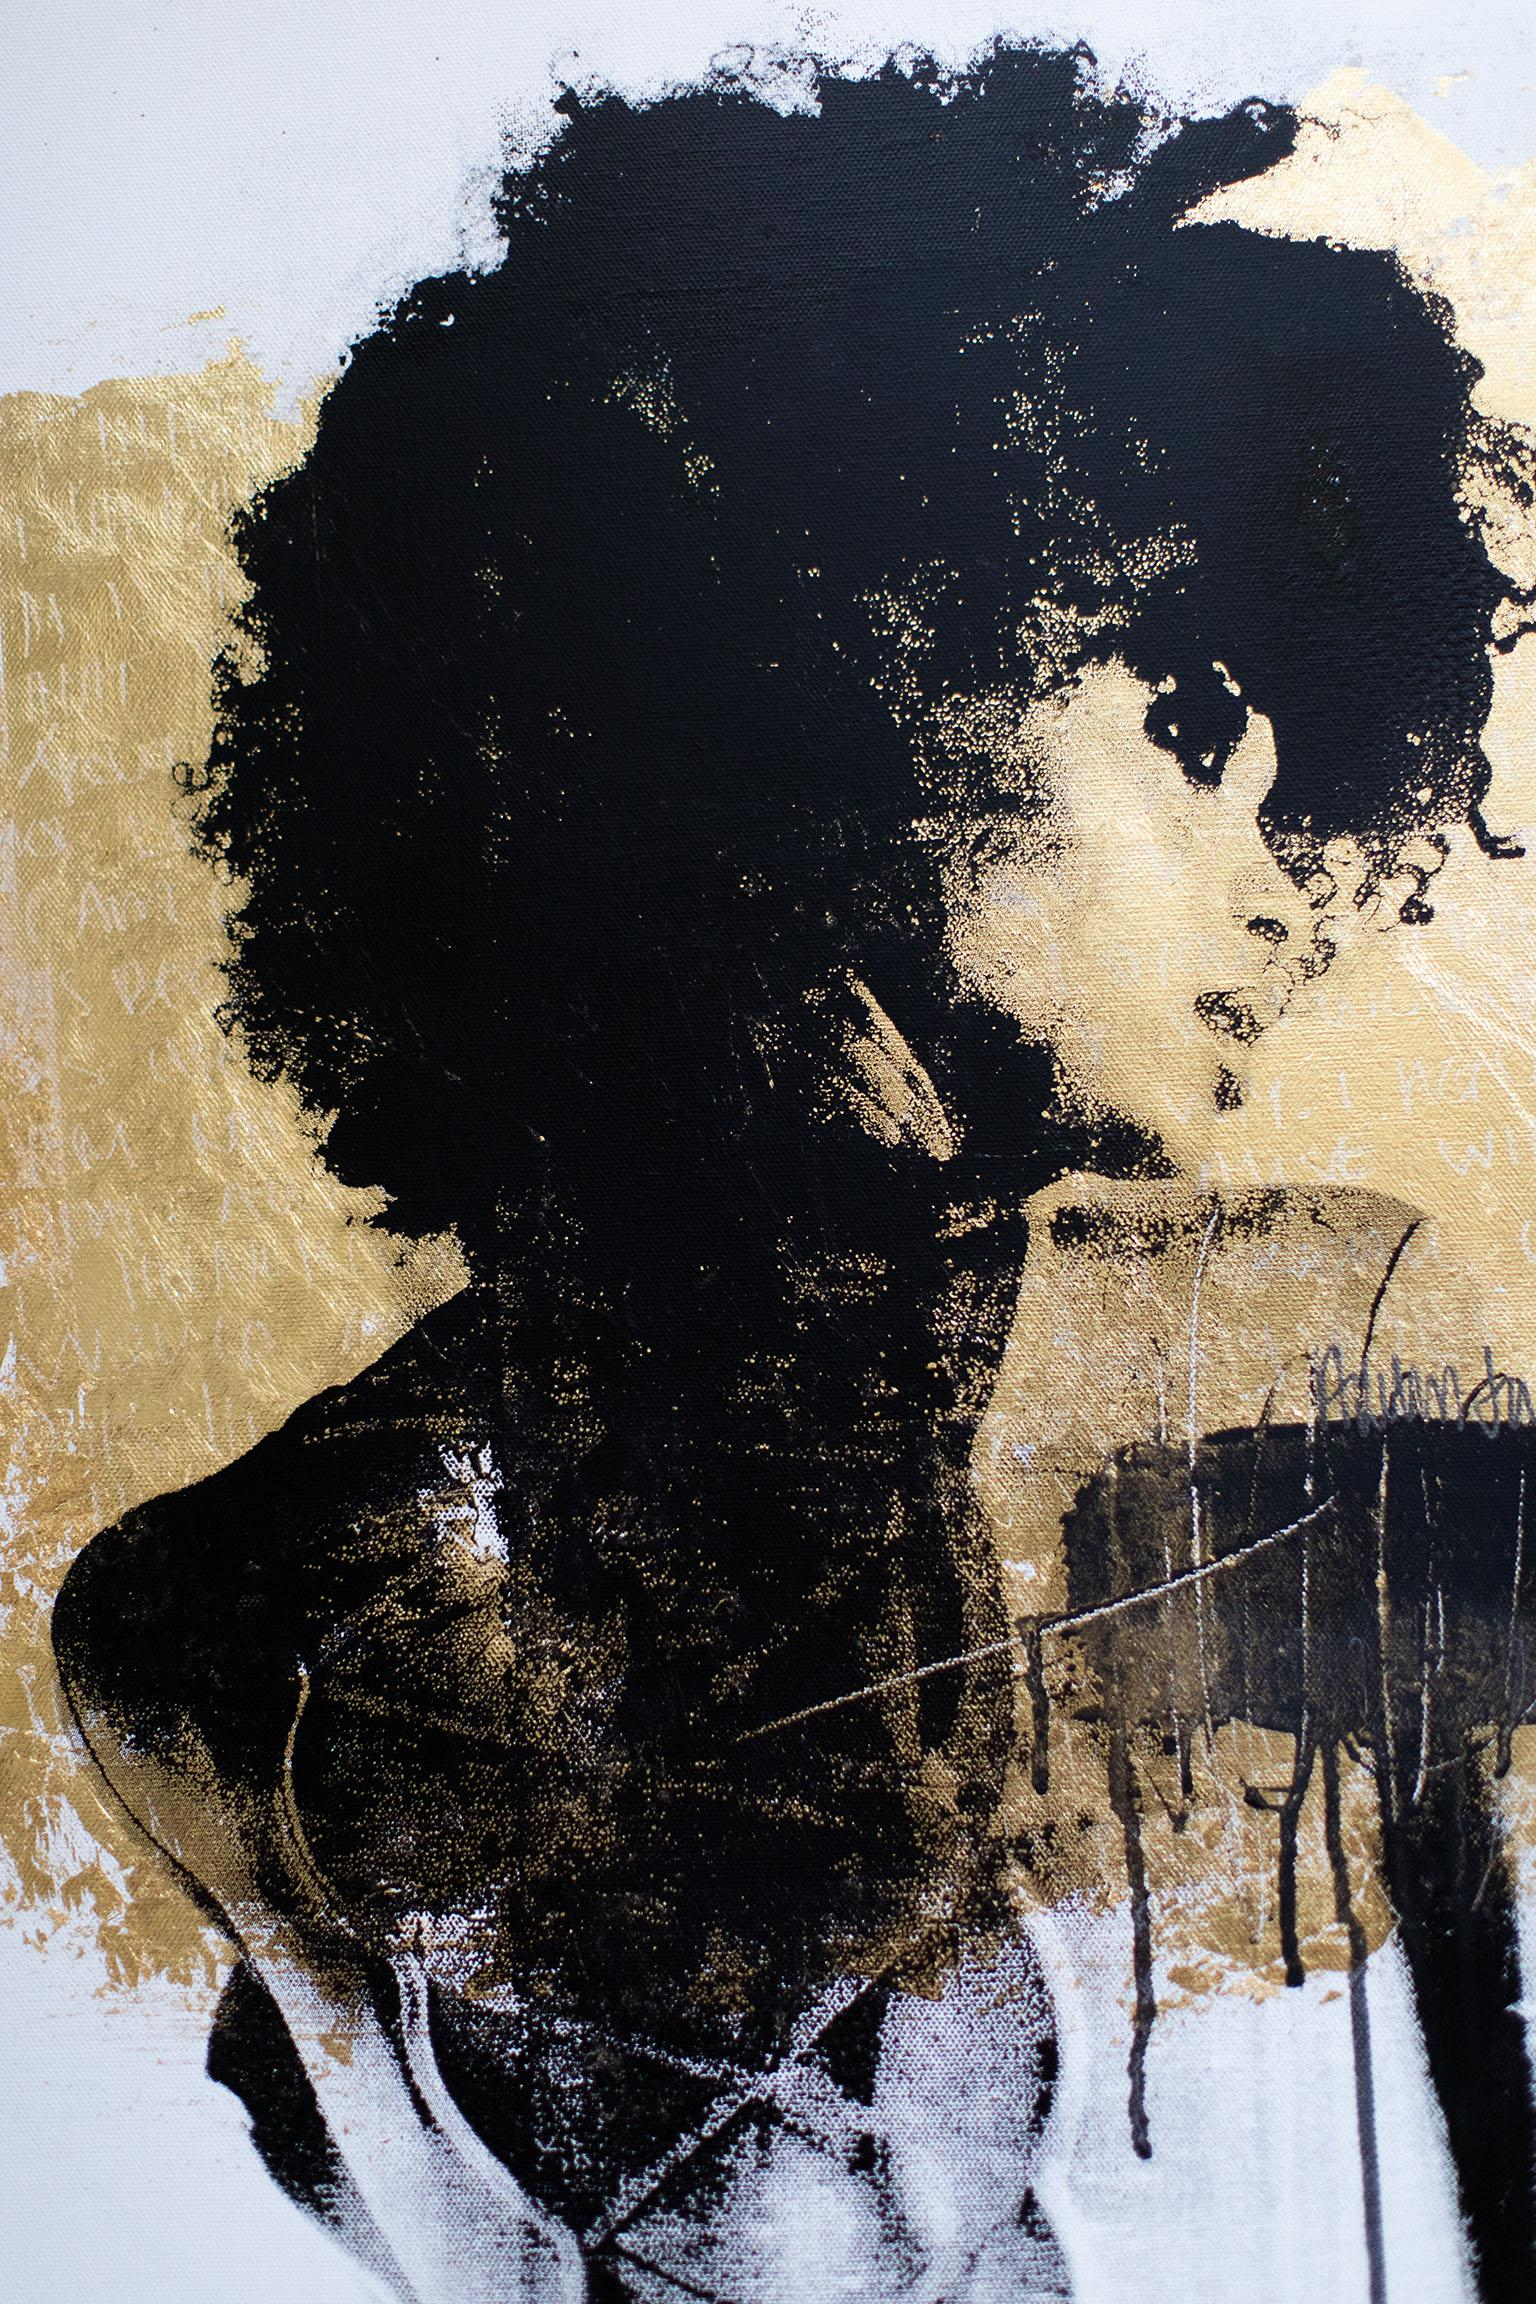 Modern Art Minimalist Art Street Art: Shoulder Drip in Trichrome (Cortney-A6)